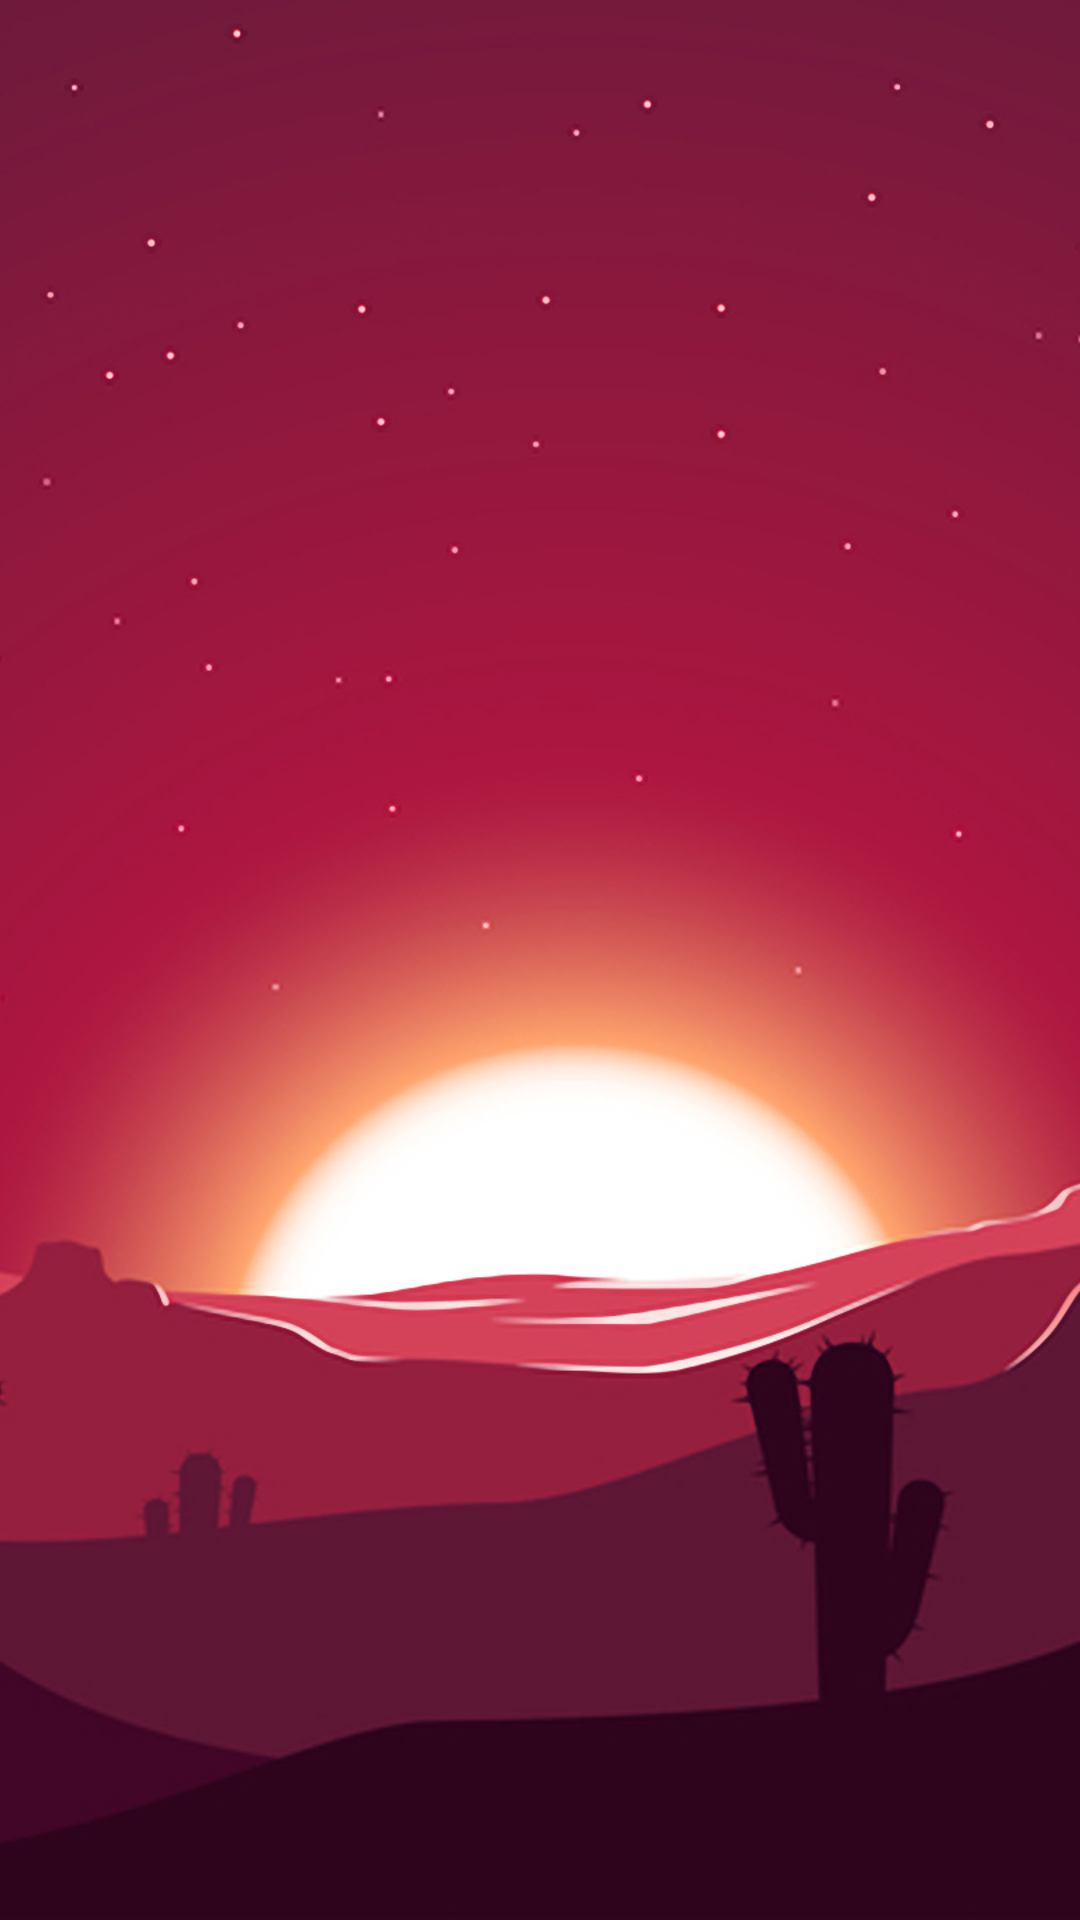 cactus sunset desert stars landscape silhouette eh 1080x1920 - Pack de Fondos de Pantalla Minimalistas (+100 Imagenes)